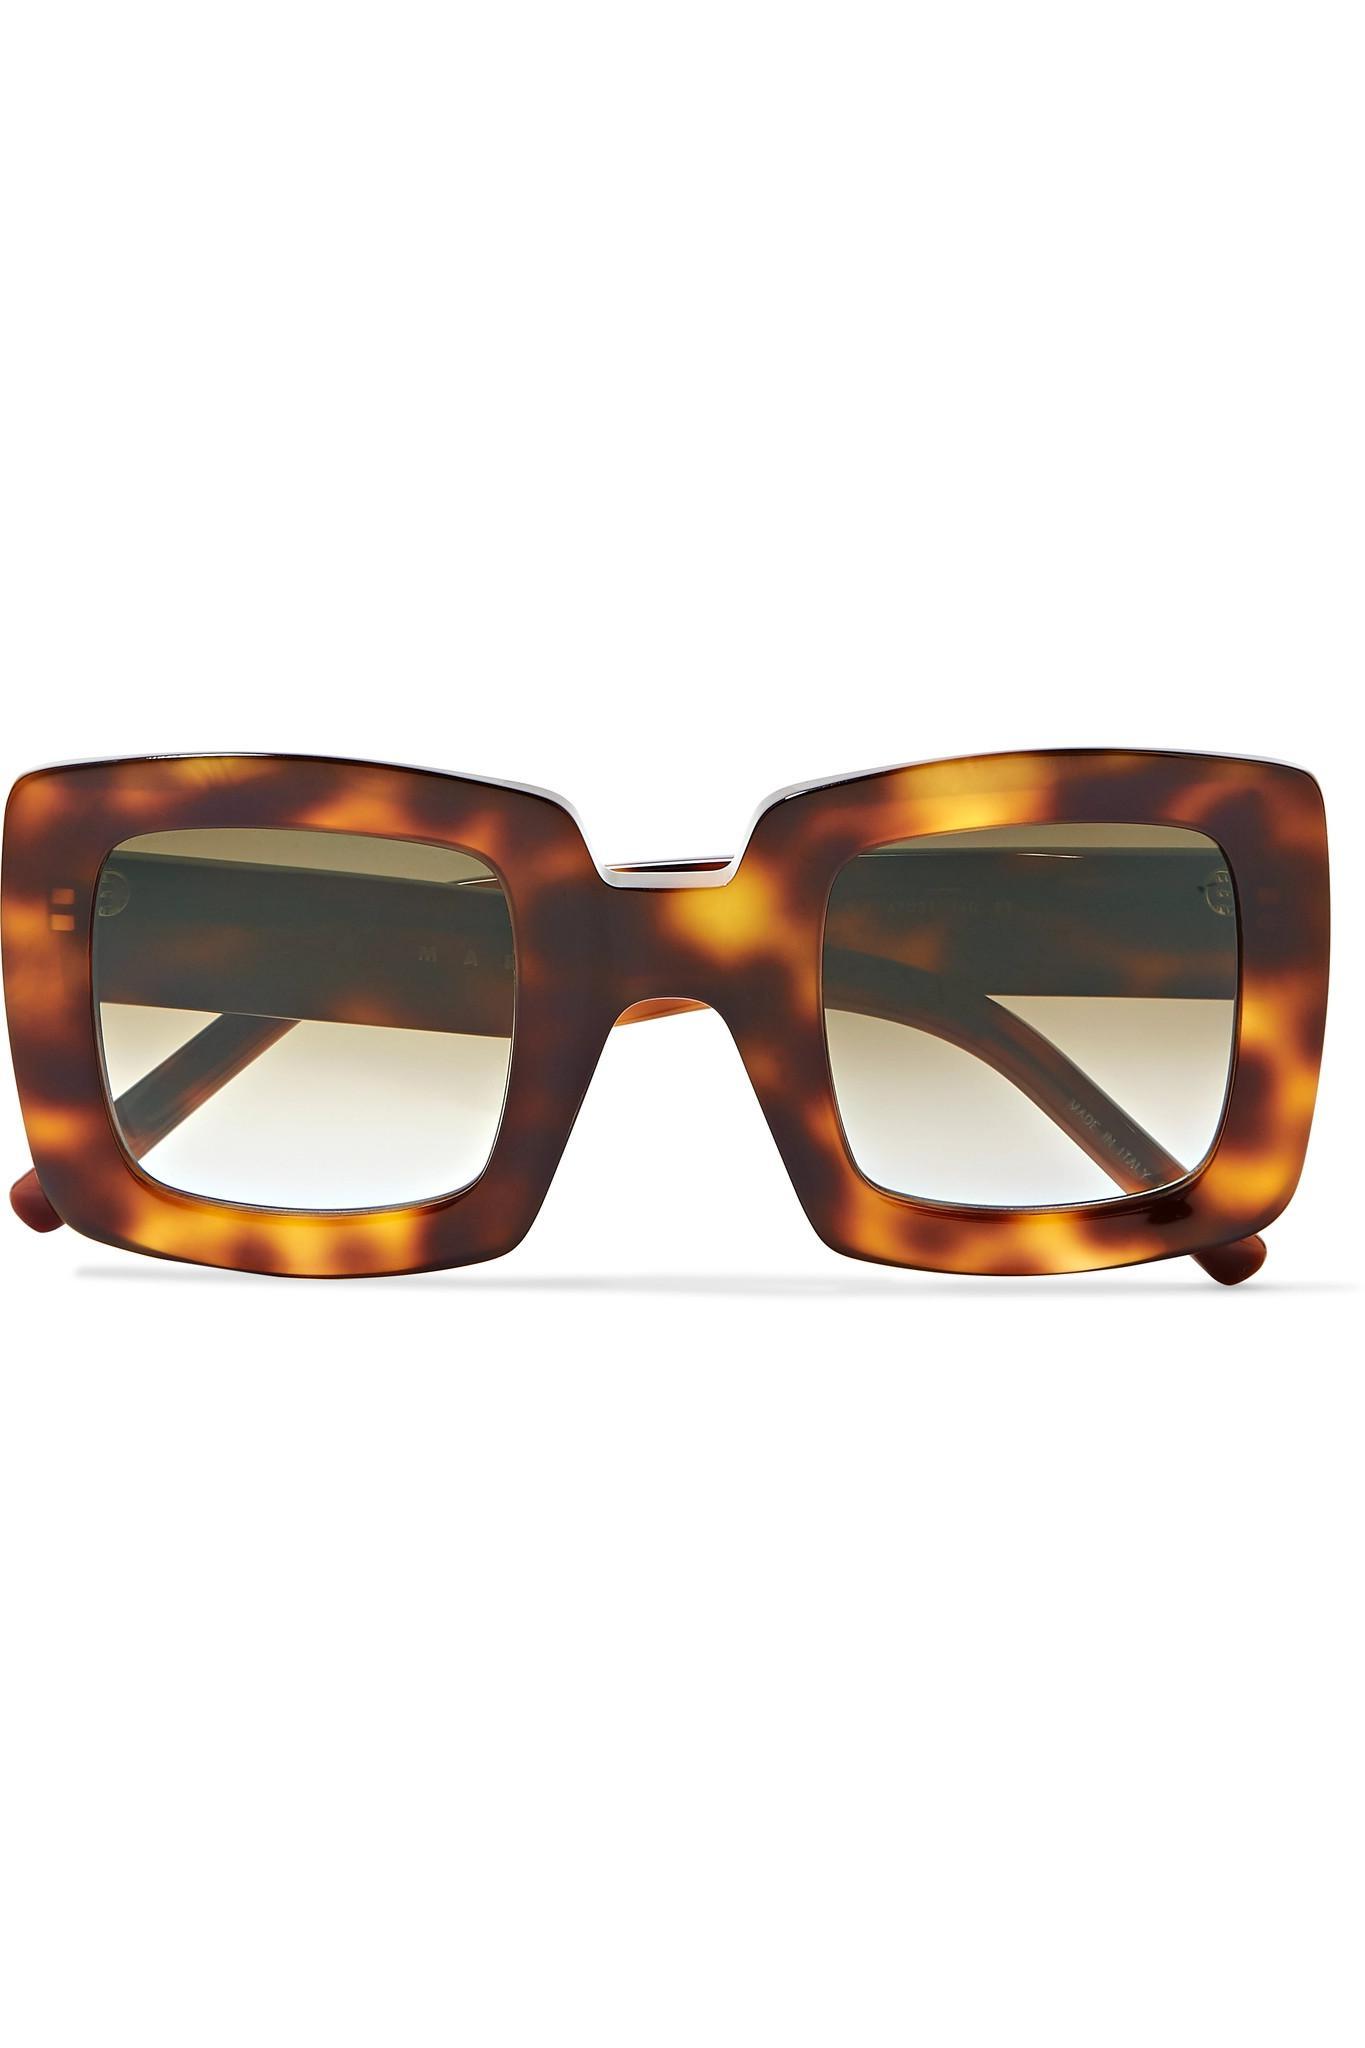 95d7afe5bdf Marni. Women s Oversized Square-frame Tortoiseshell Acetate Sunglasses